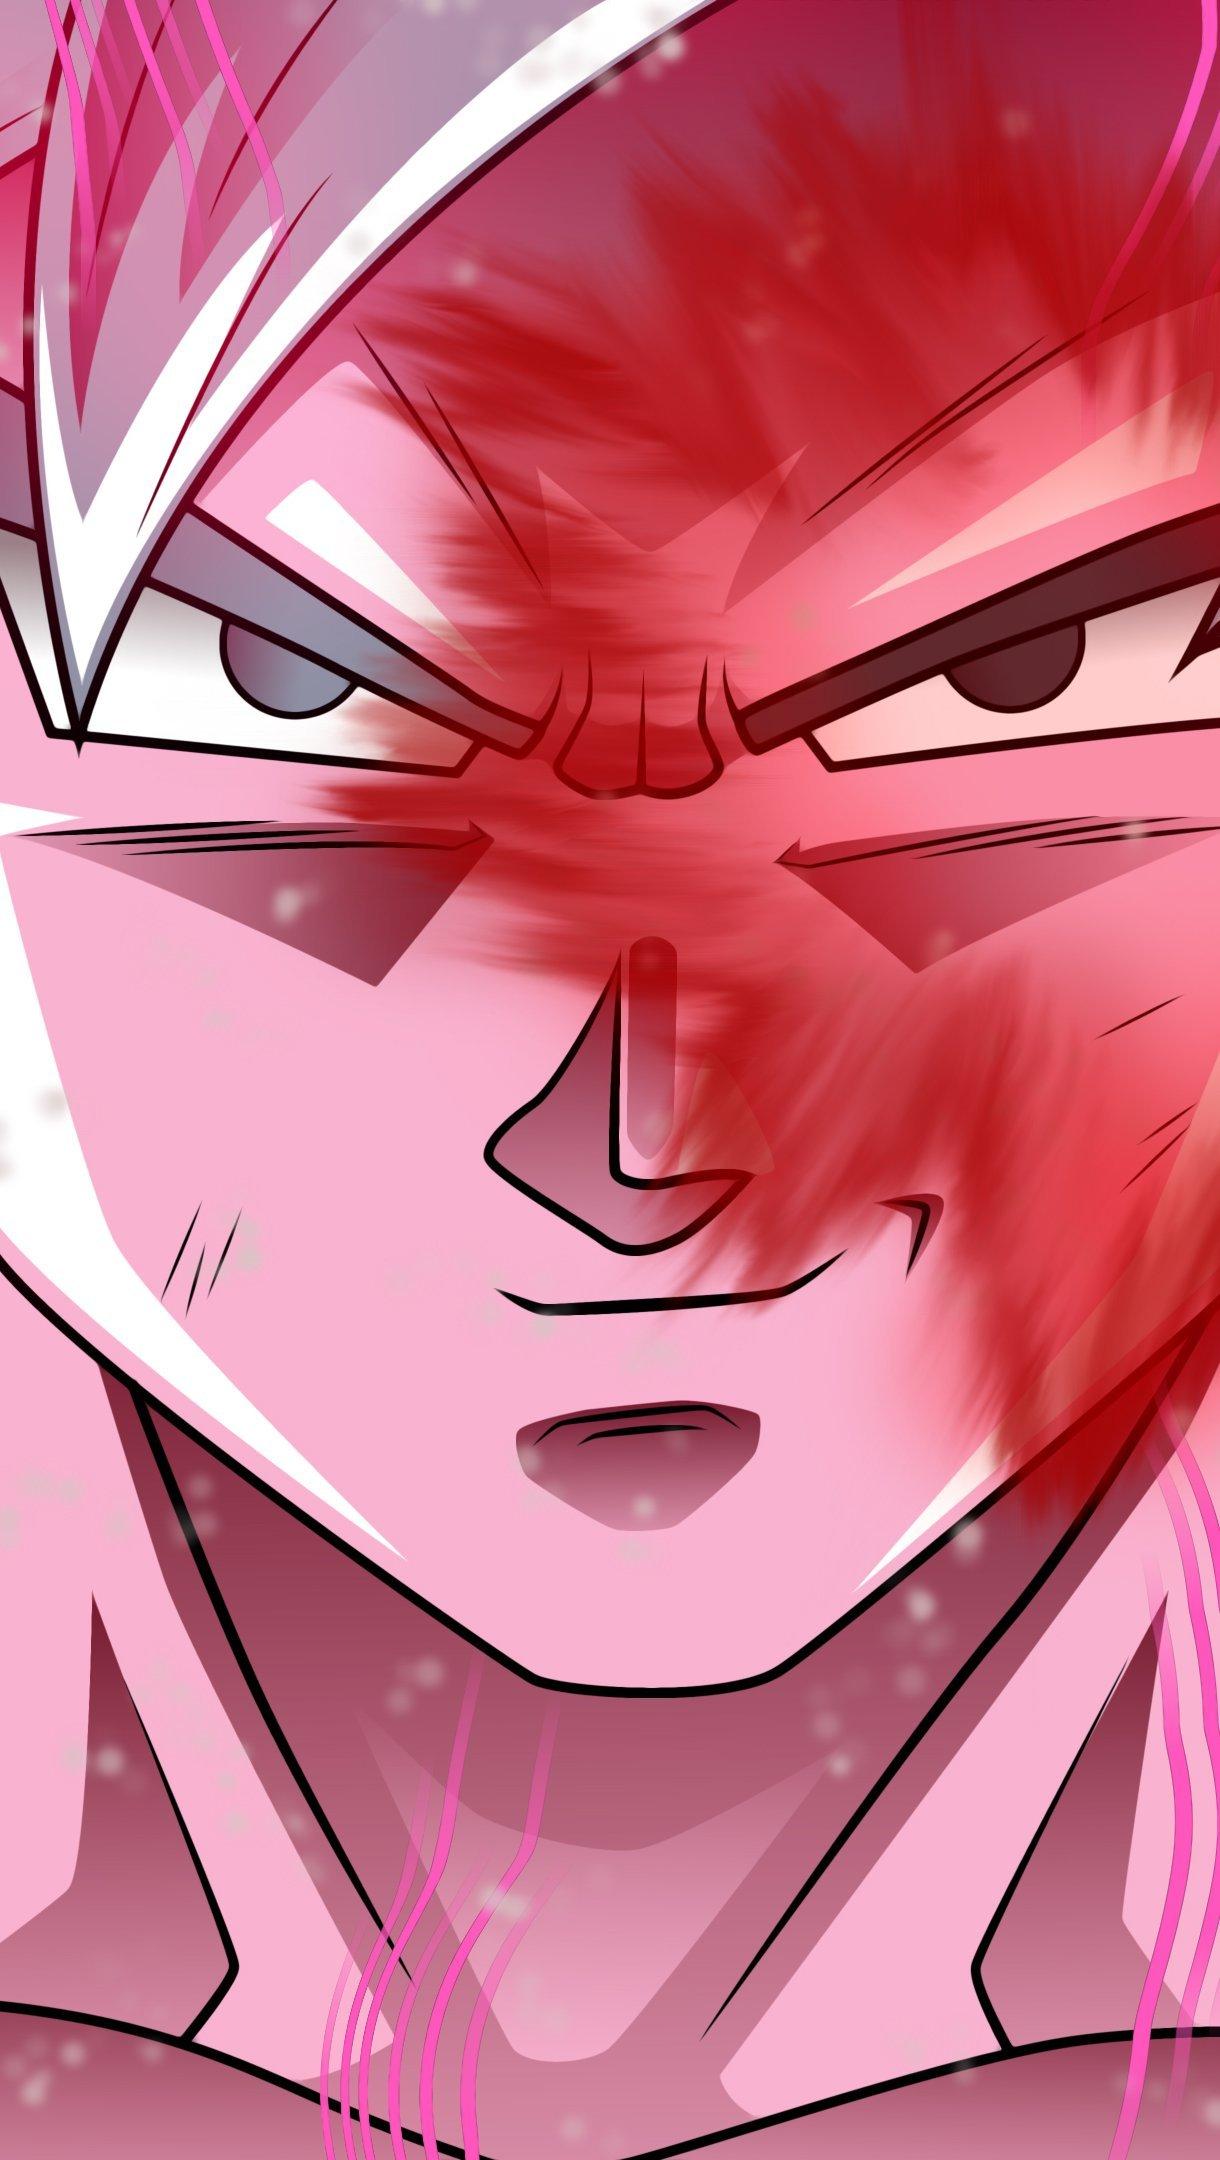 Anime Wallpaper Goku from Dragon Ball Super Vertical